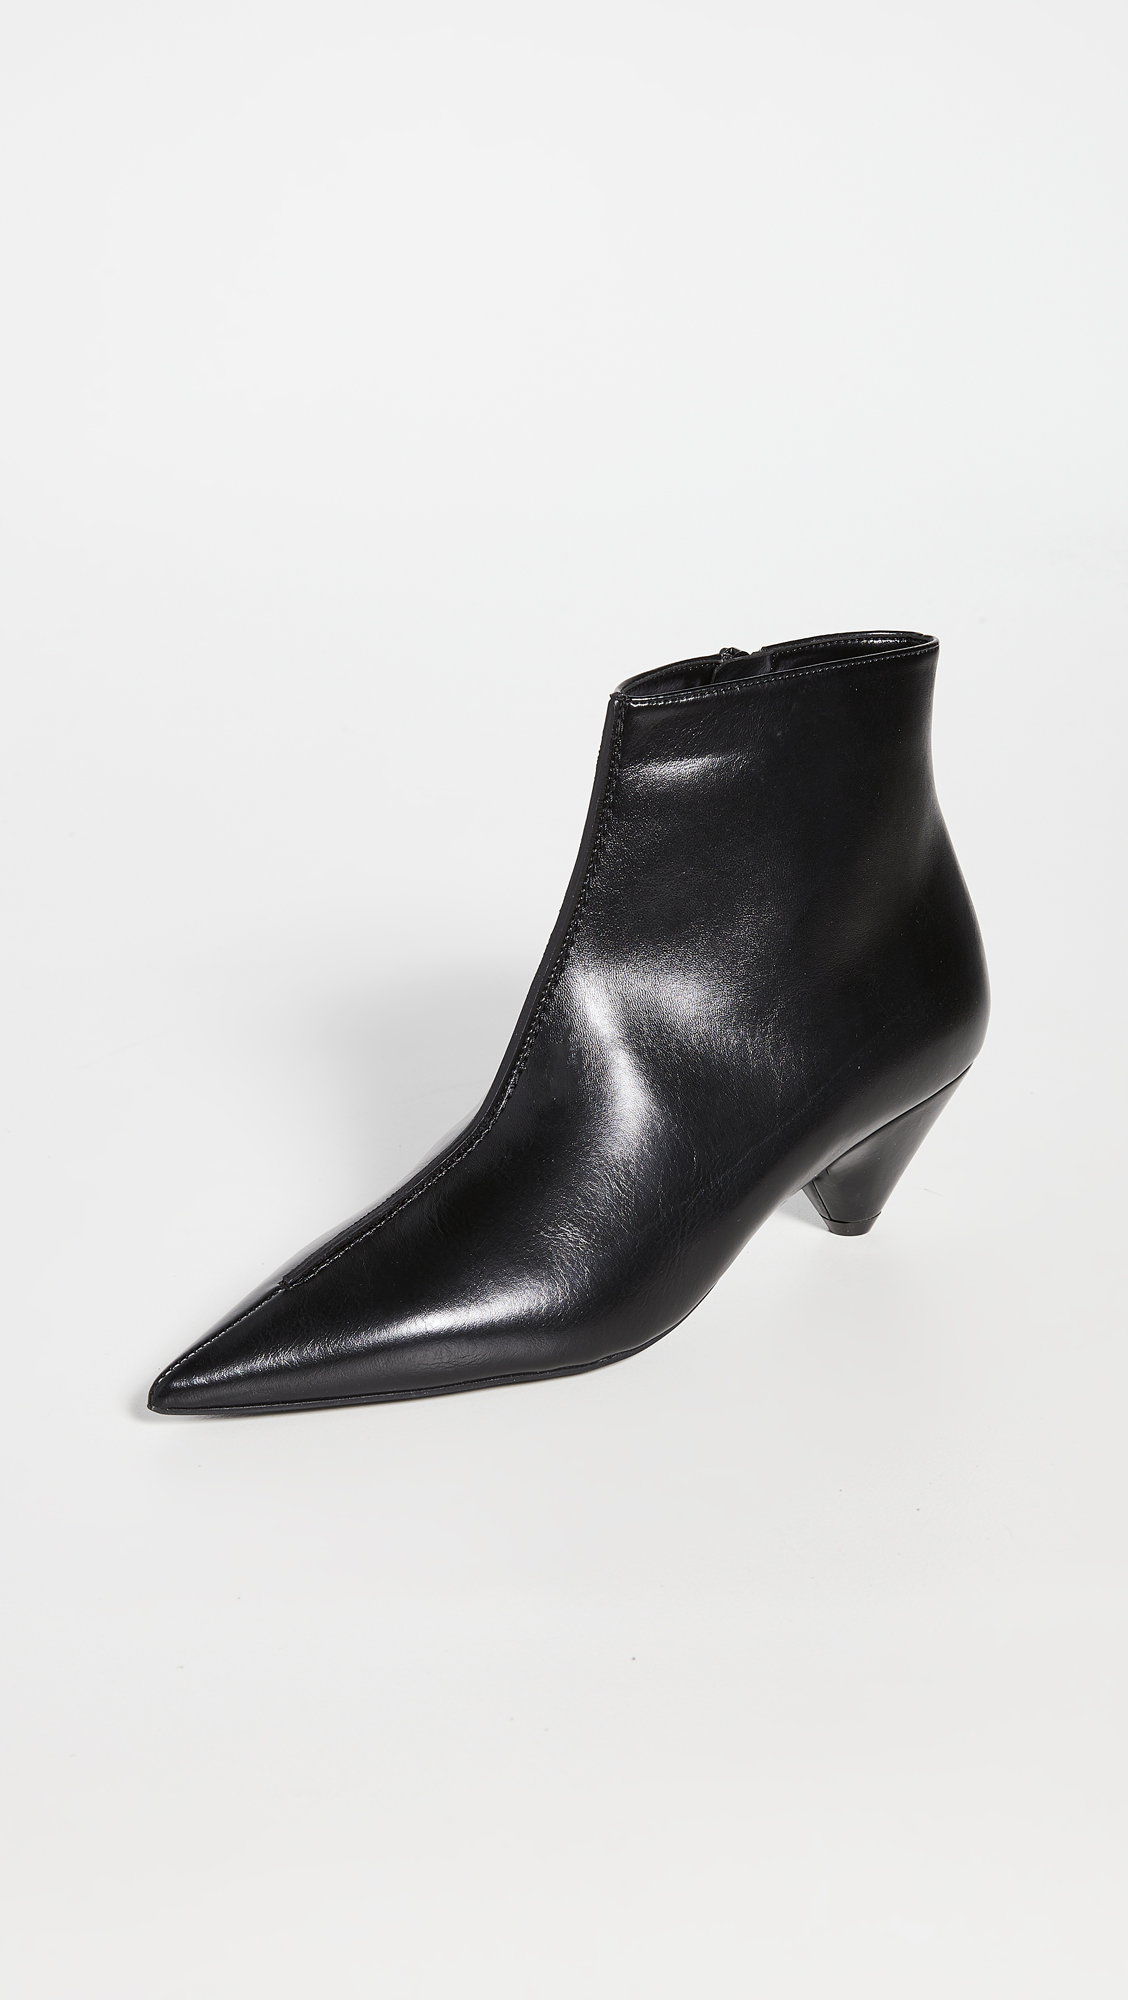 Stella McCartney Ariane Shoes